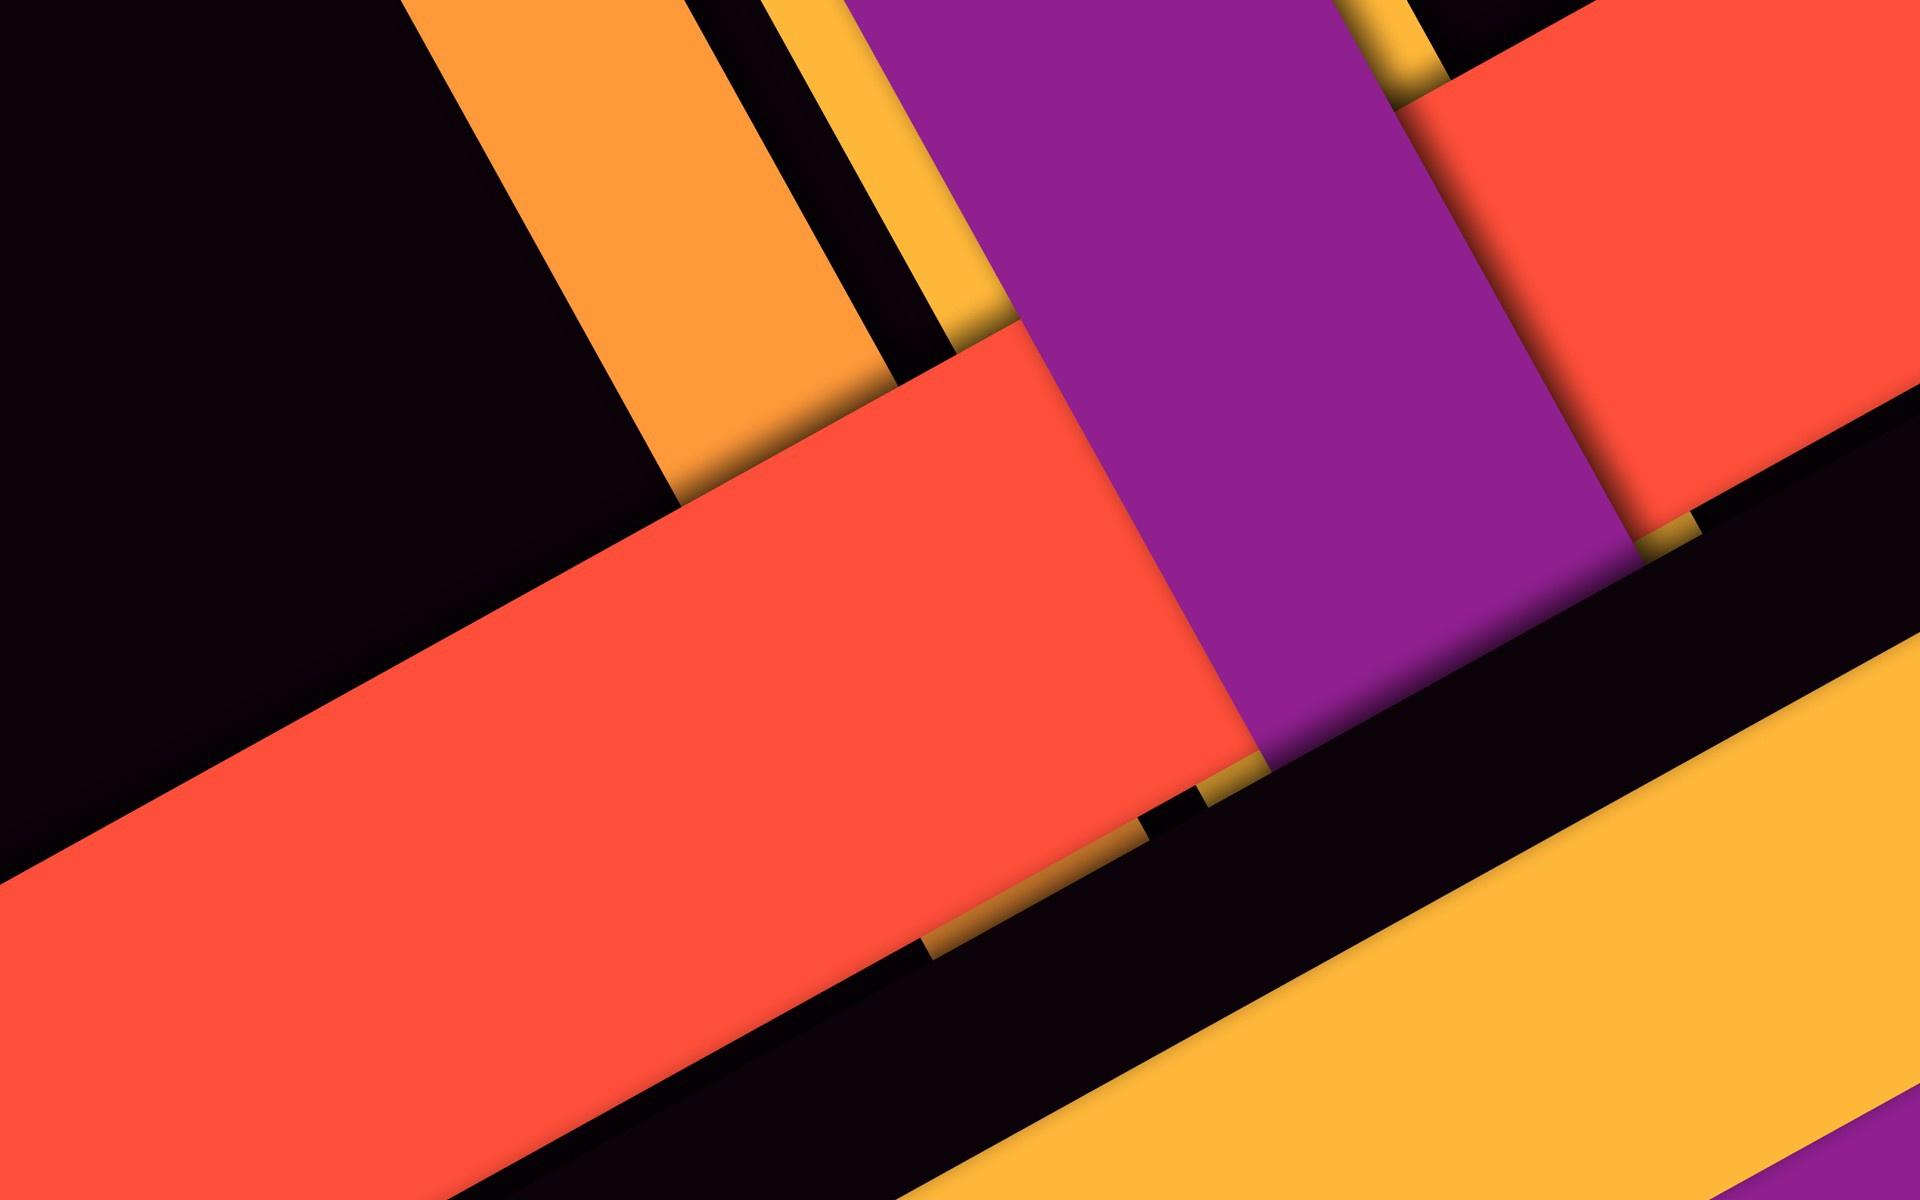 material design желтый красный  № 2972656 бесплатно